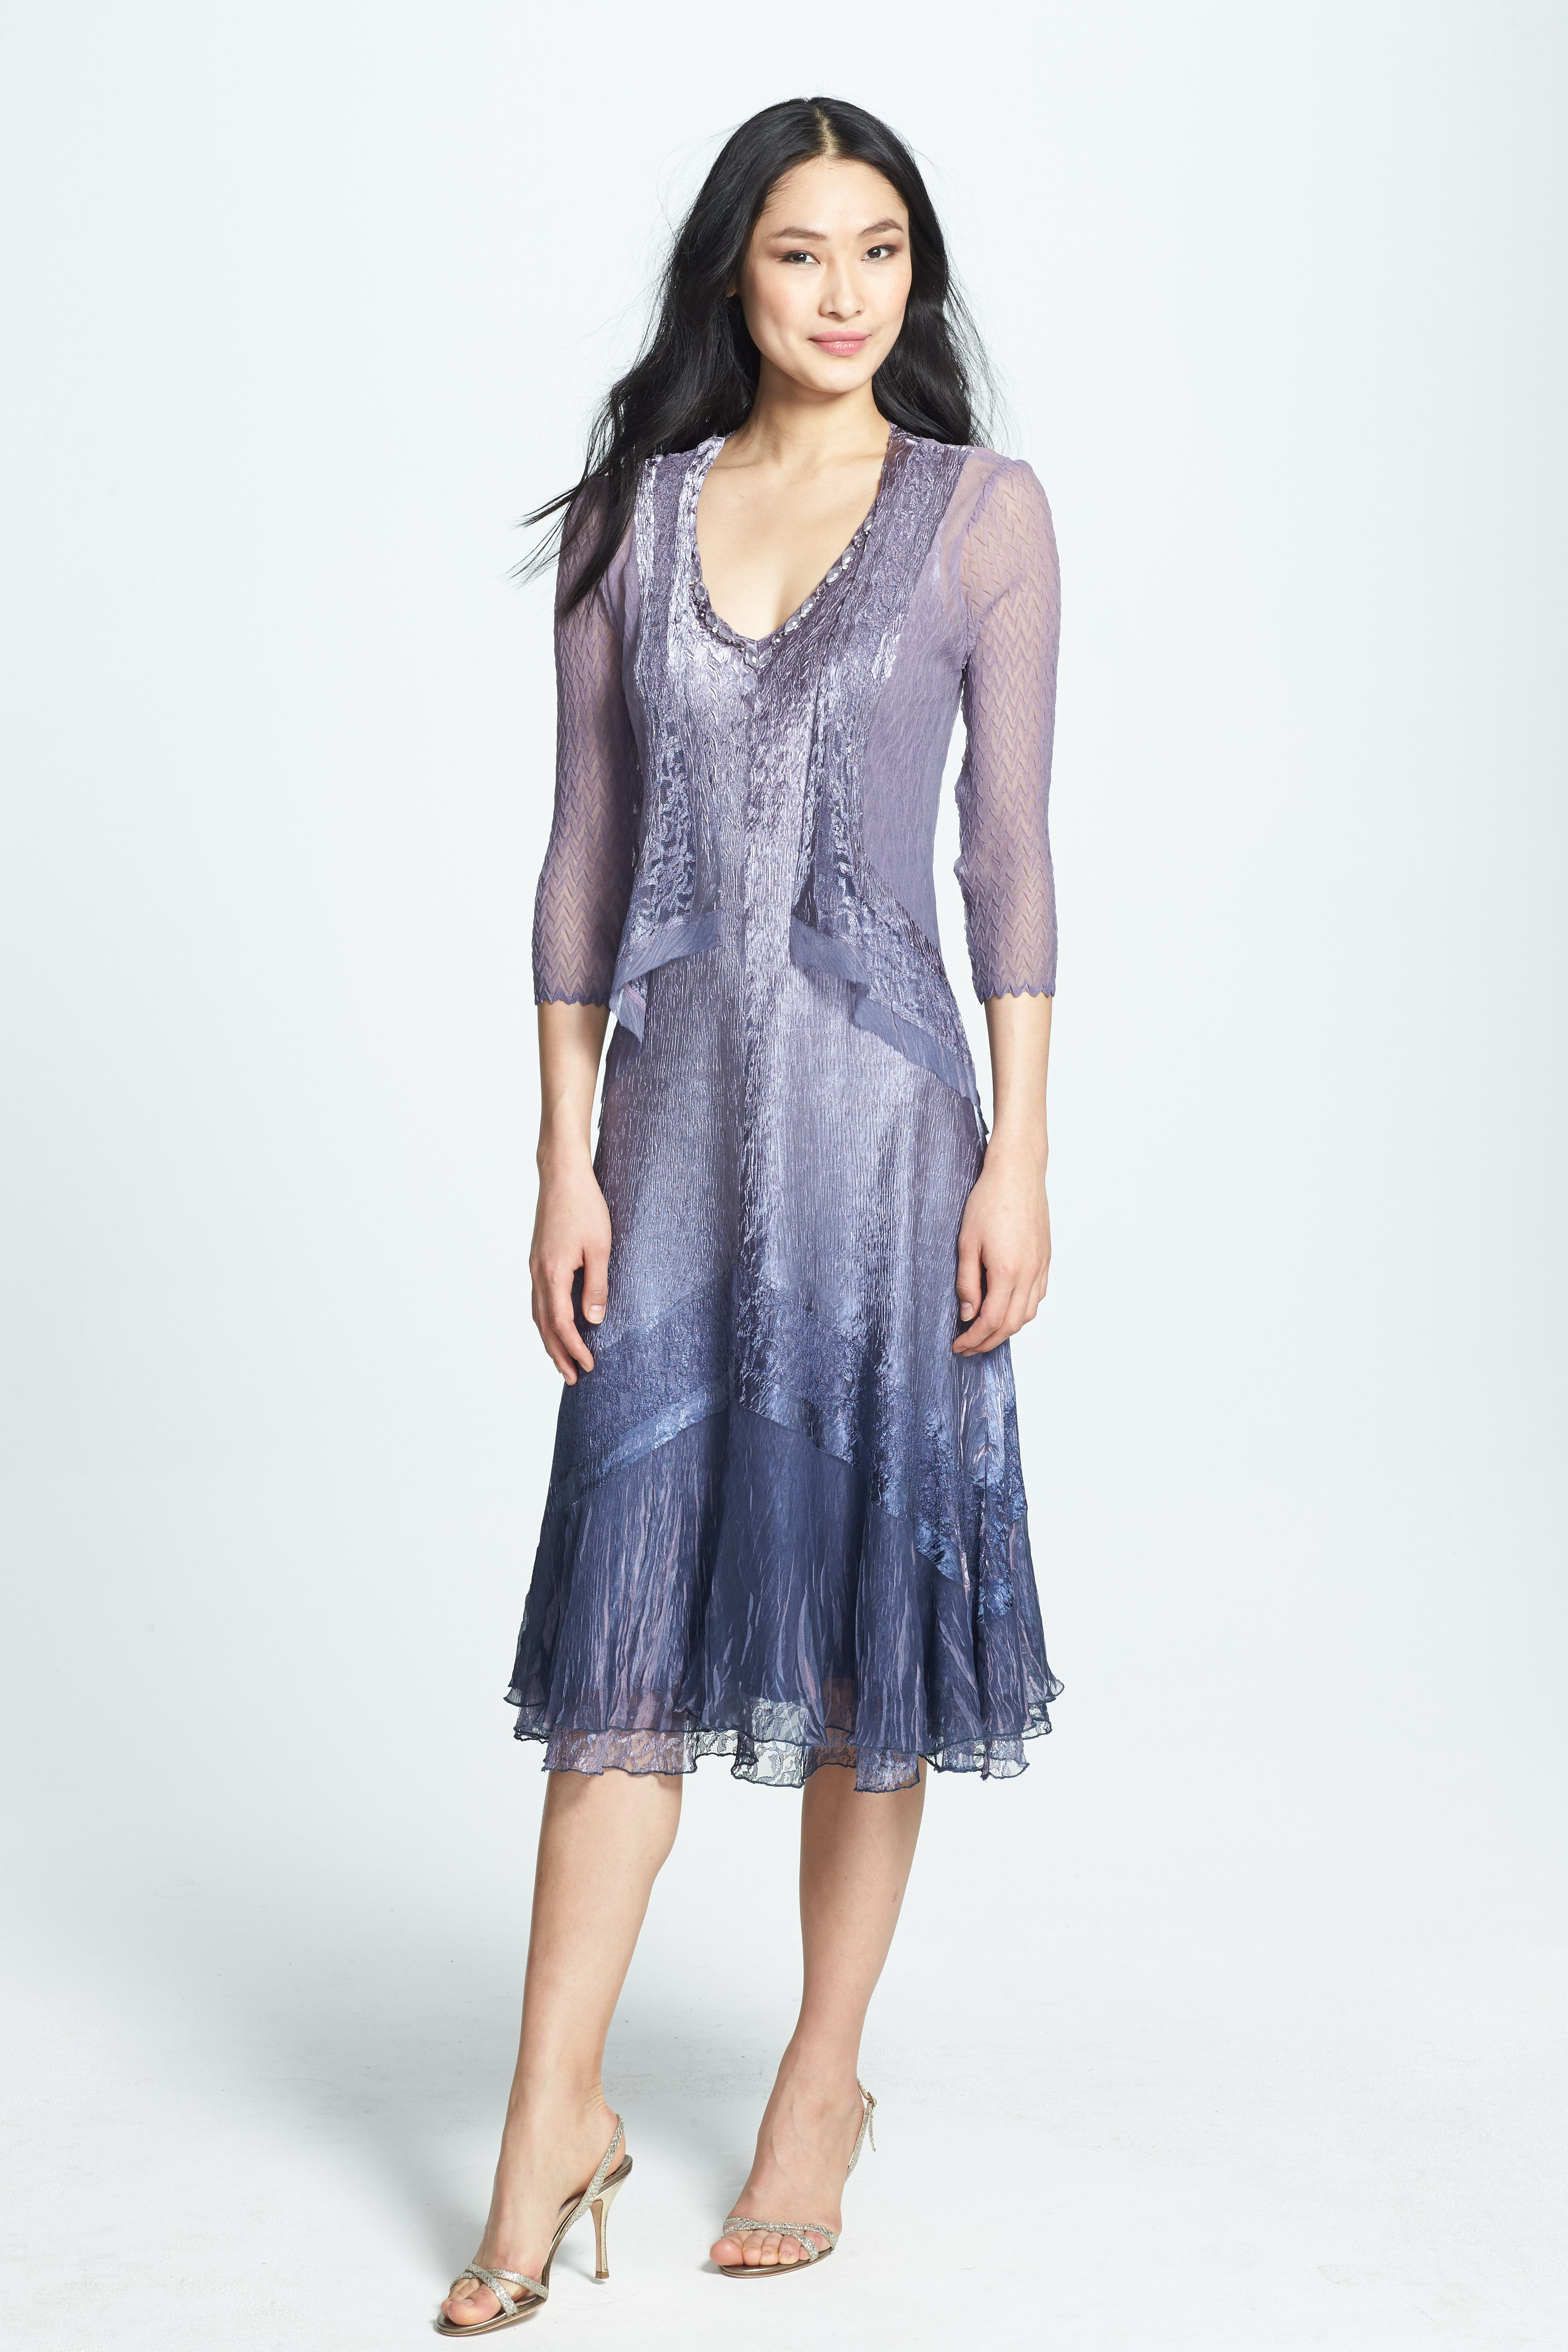 1930s Dresses | 30s Art Deco Dress Komarov Beaded Neck Charmeuse Dress  Jacket Size Large - Purple $262.80 AT vintagedancer.com